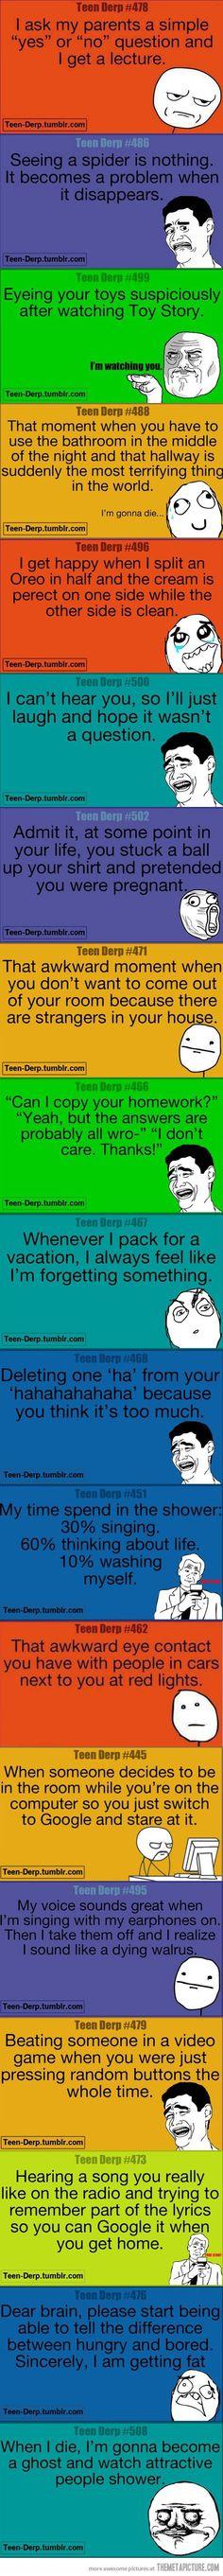 hahahaha true true true